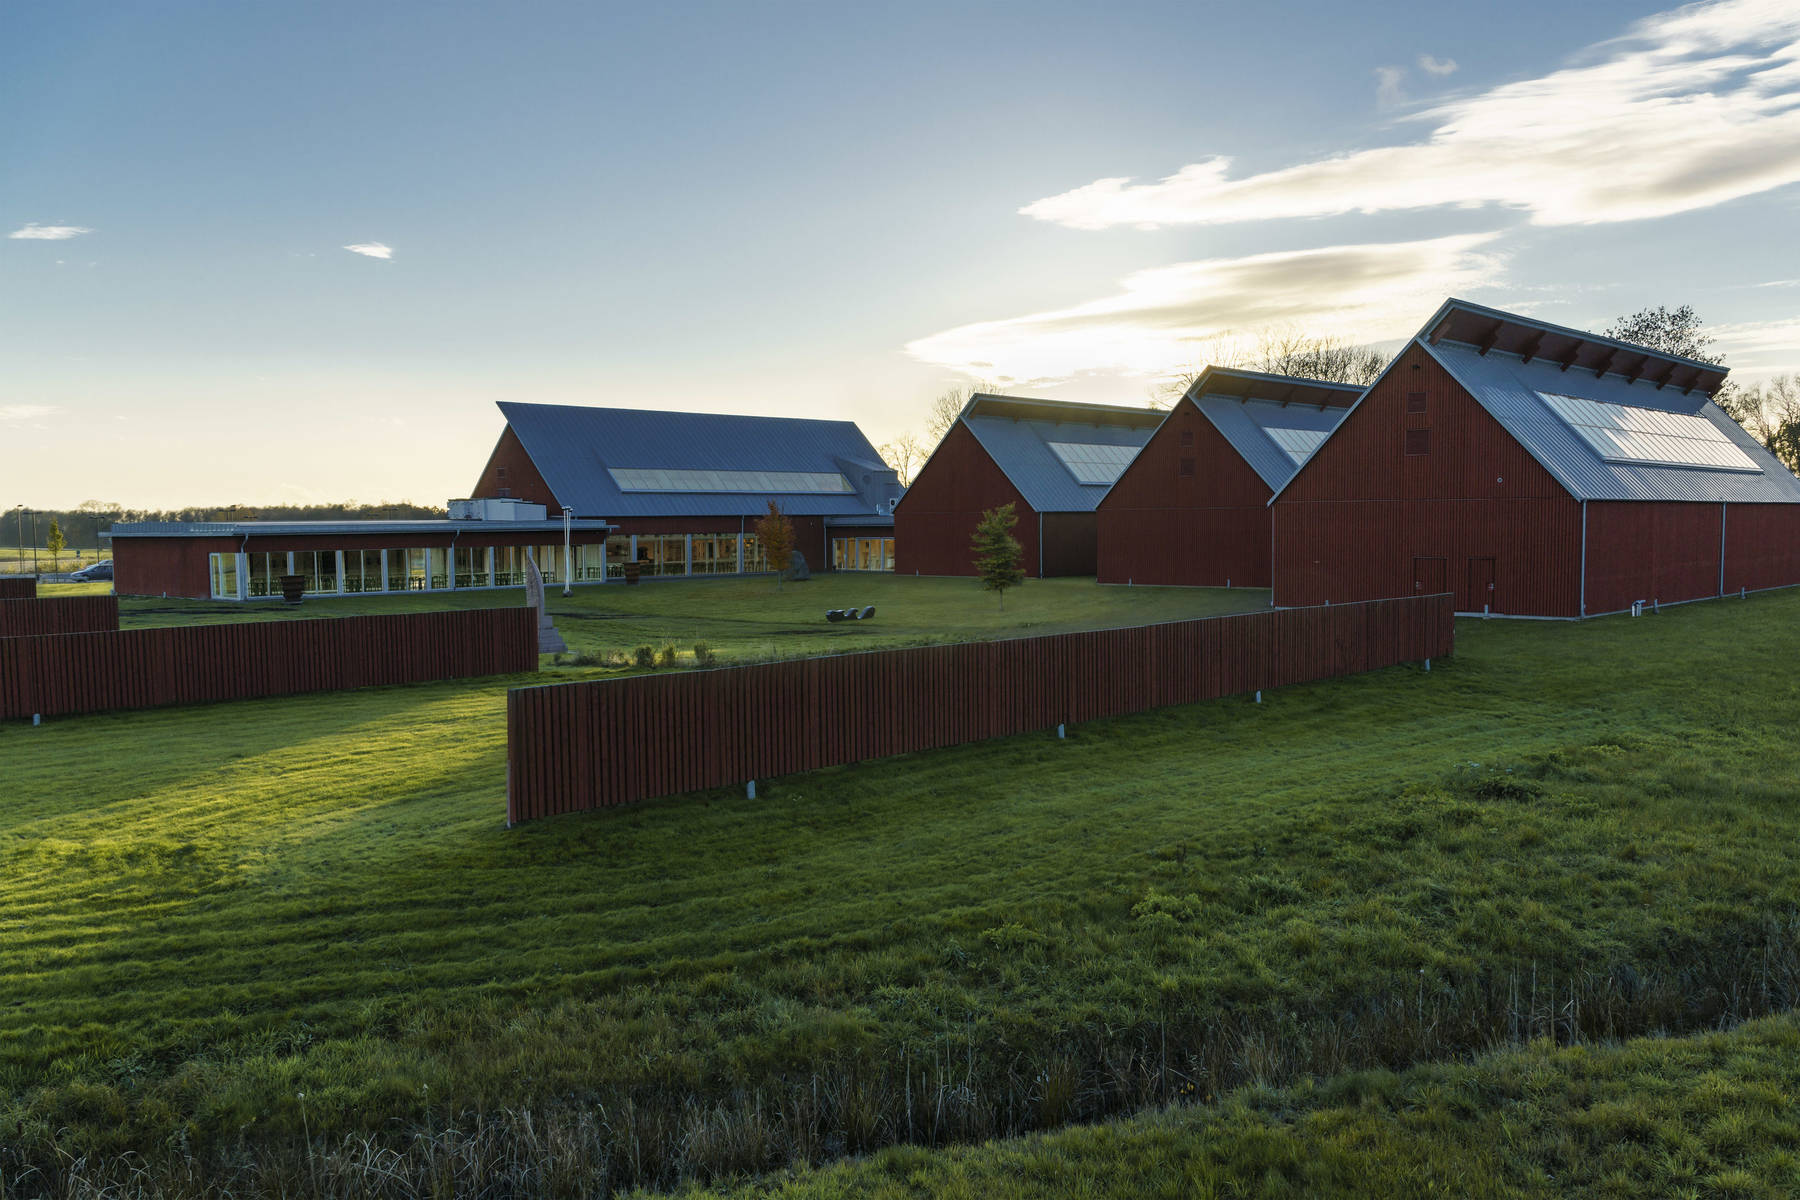 Renzo Pianos arkitektur med röda lador